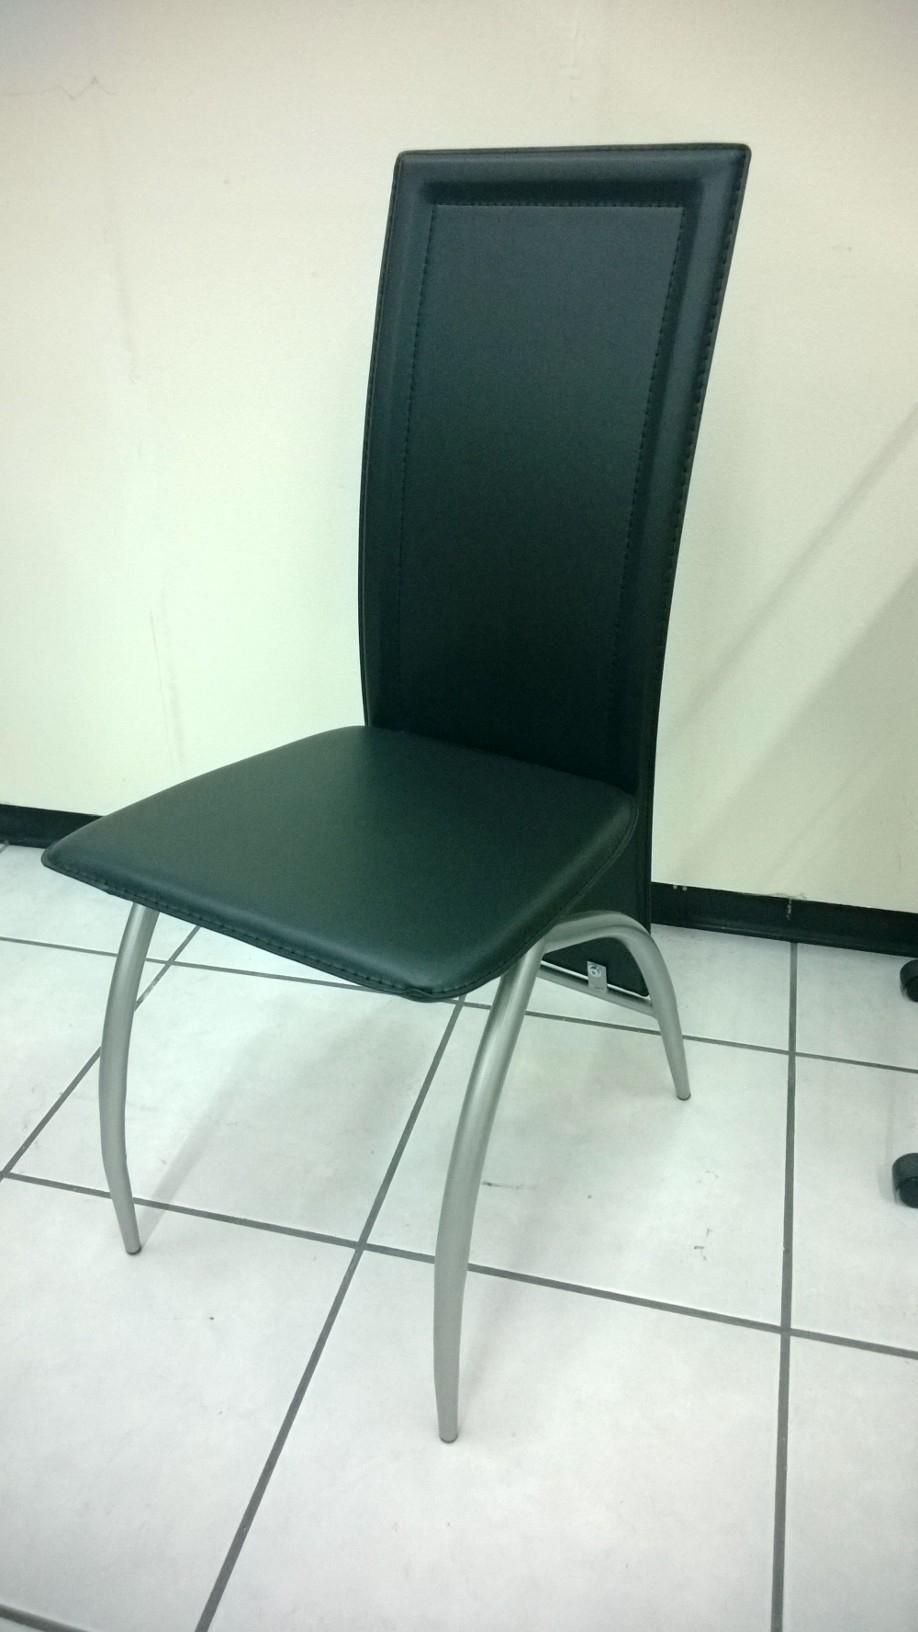 Sedia ecopelle in svendita sedie a prezzi scontati - Sedie in ecopelle per cucina ...